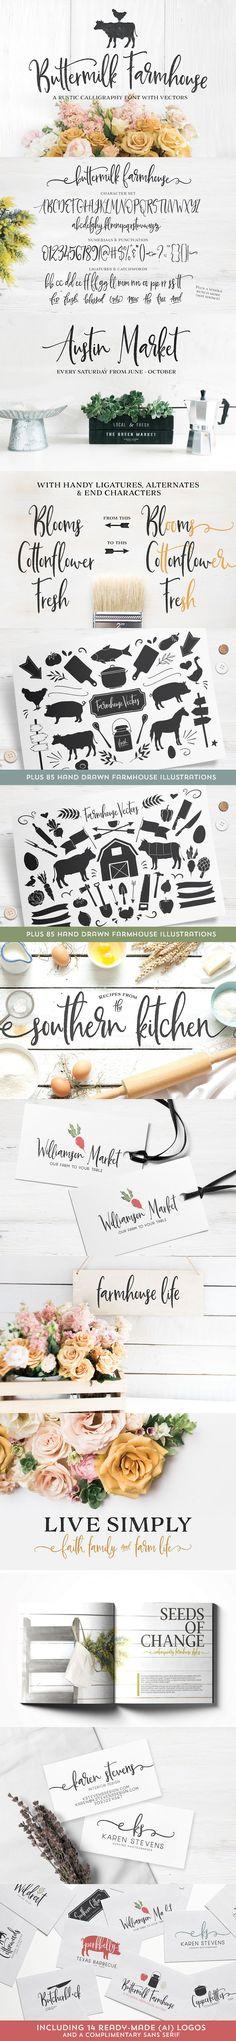 spring fever desktop wallpaper download via housemixblog